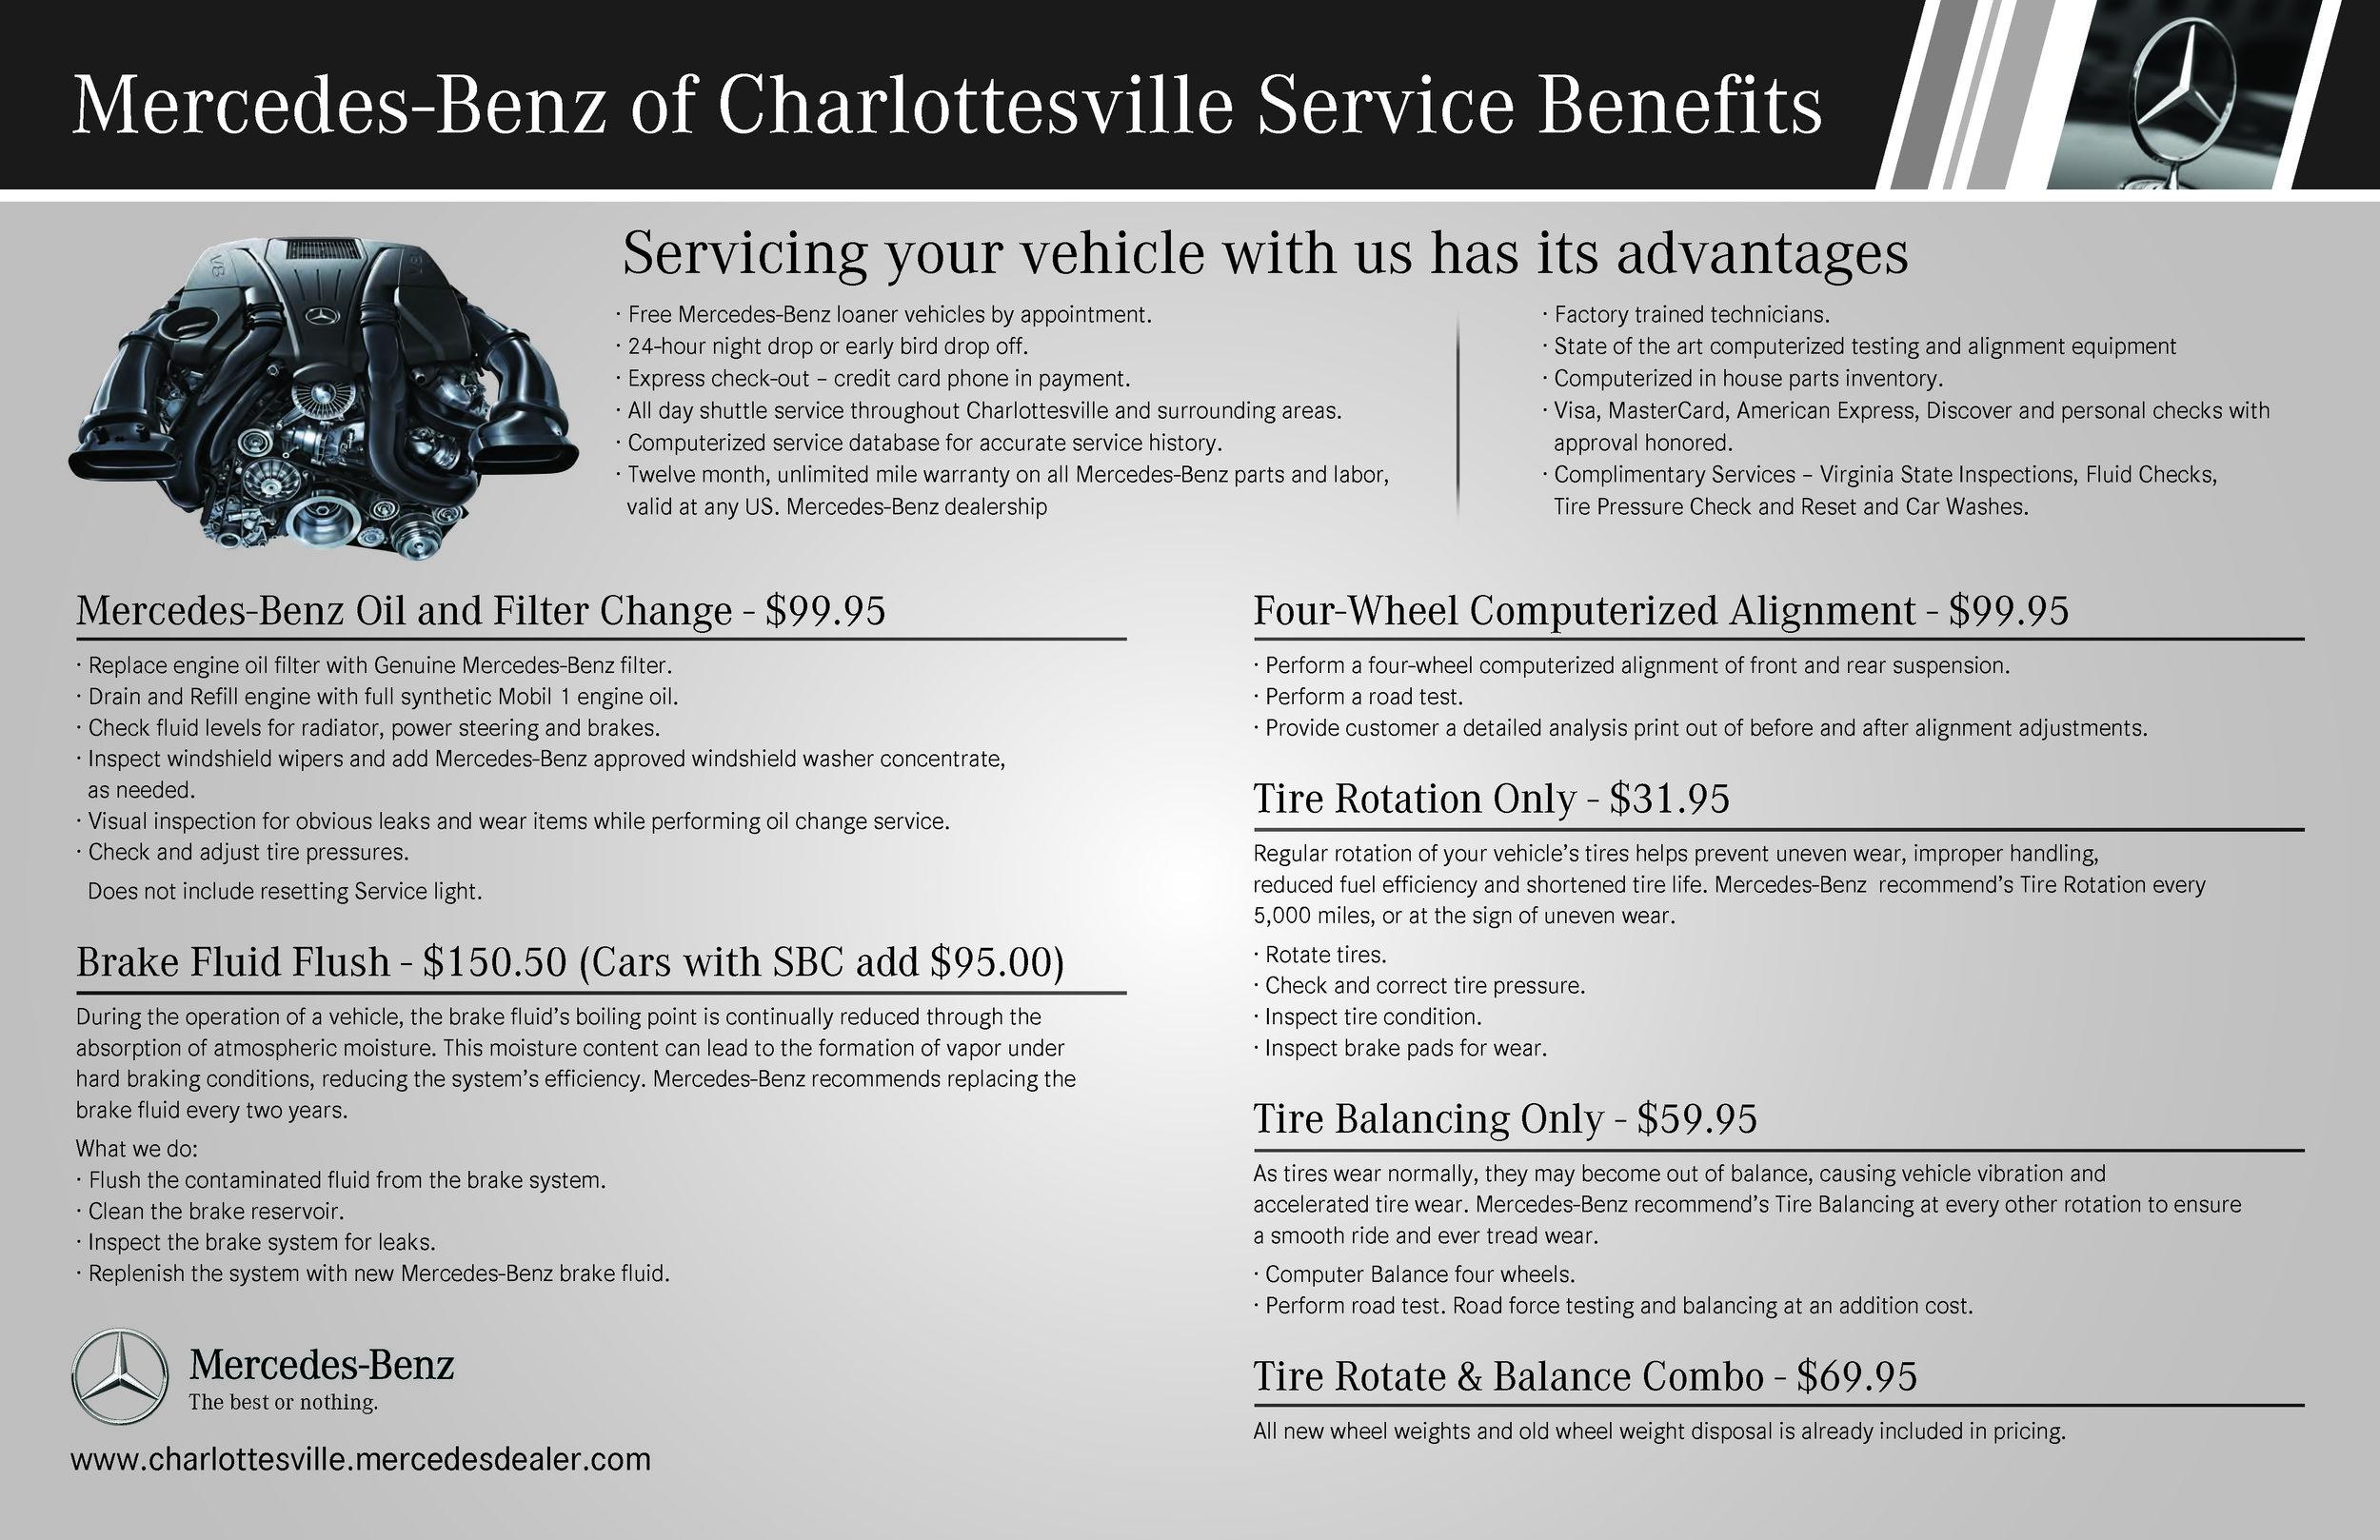 Mercedes-Benz of Charlottesville - Mat - Back.jpg